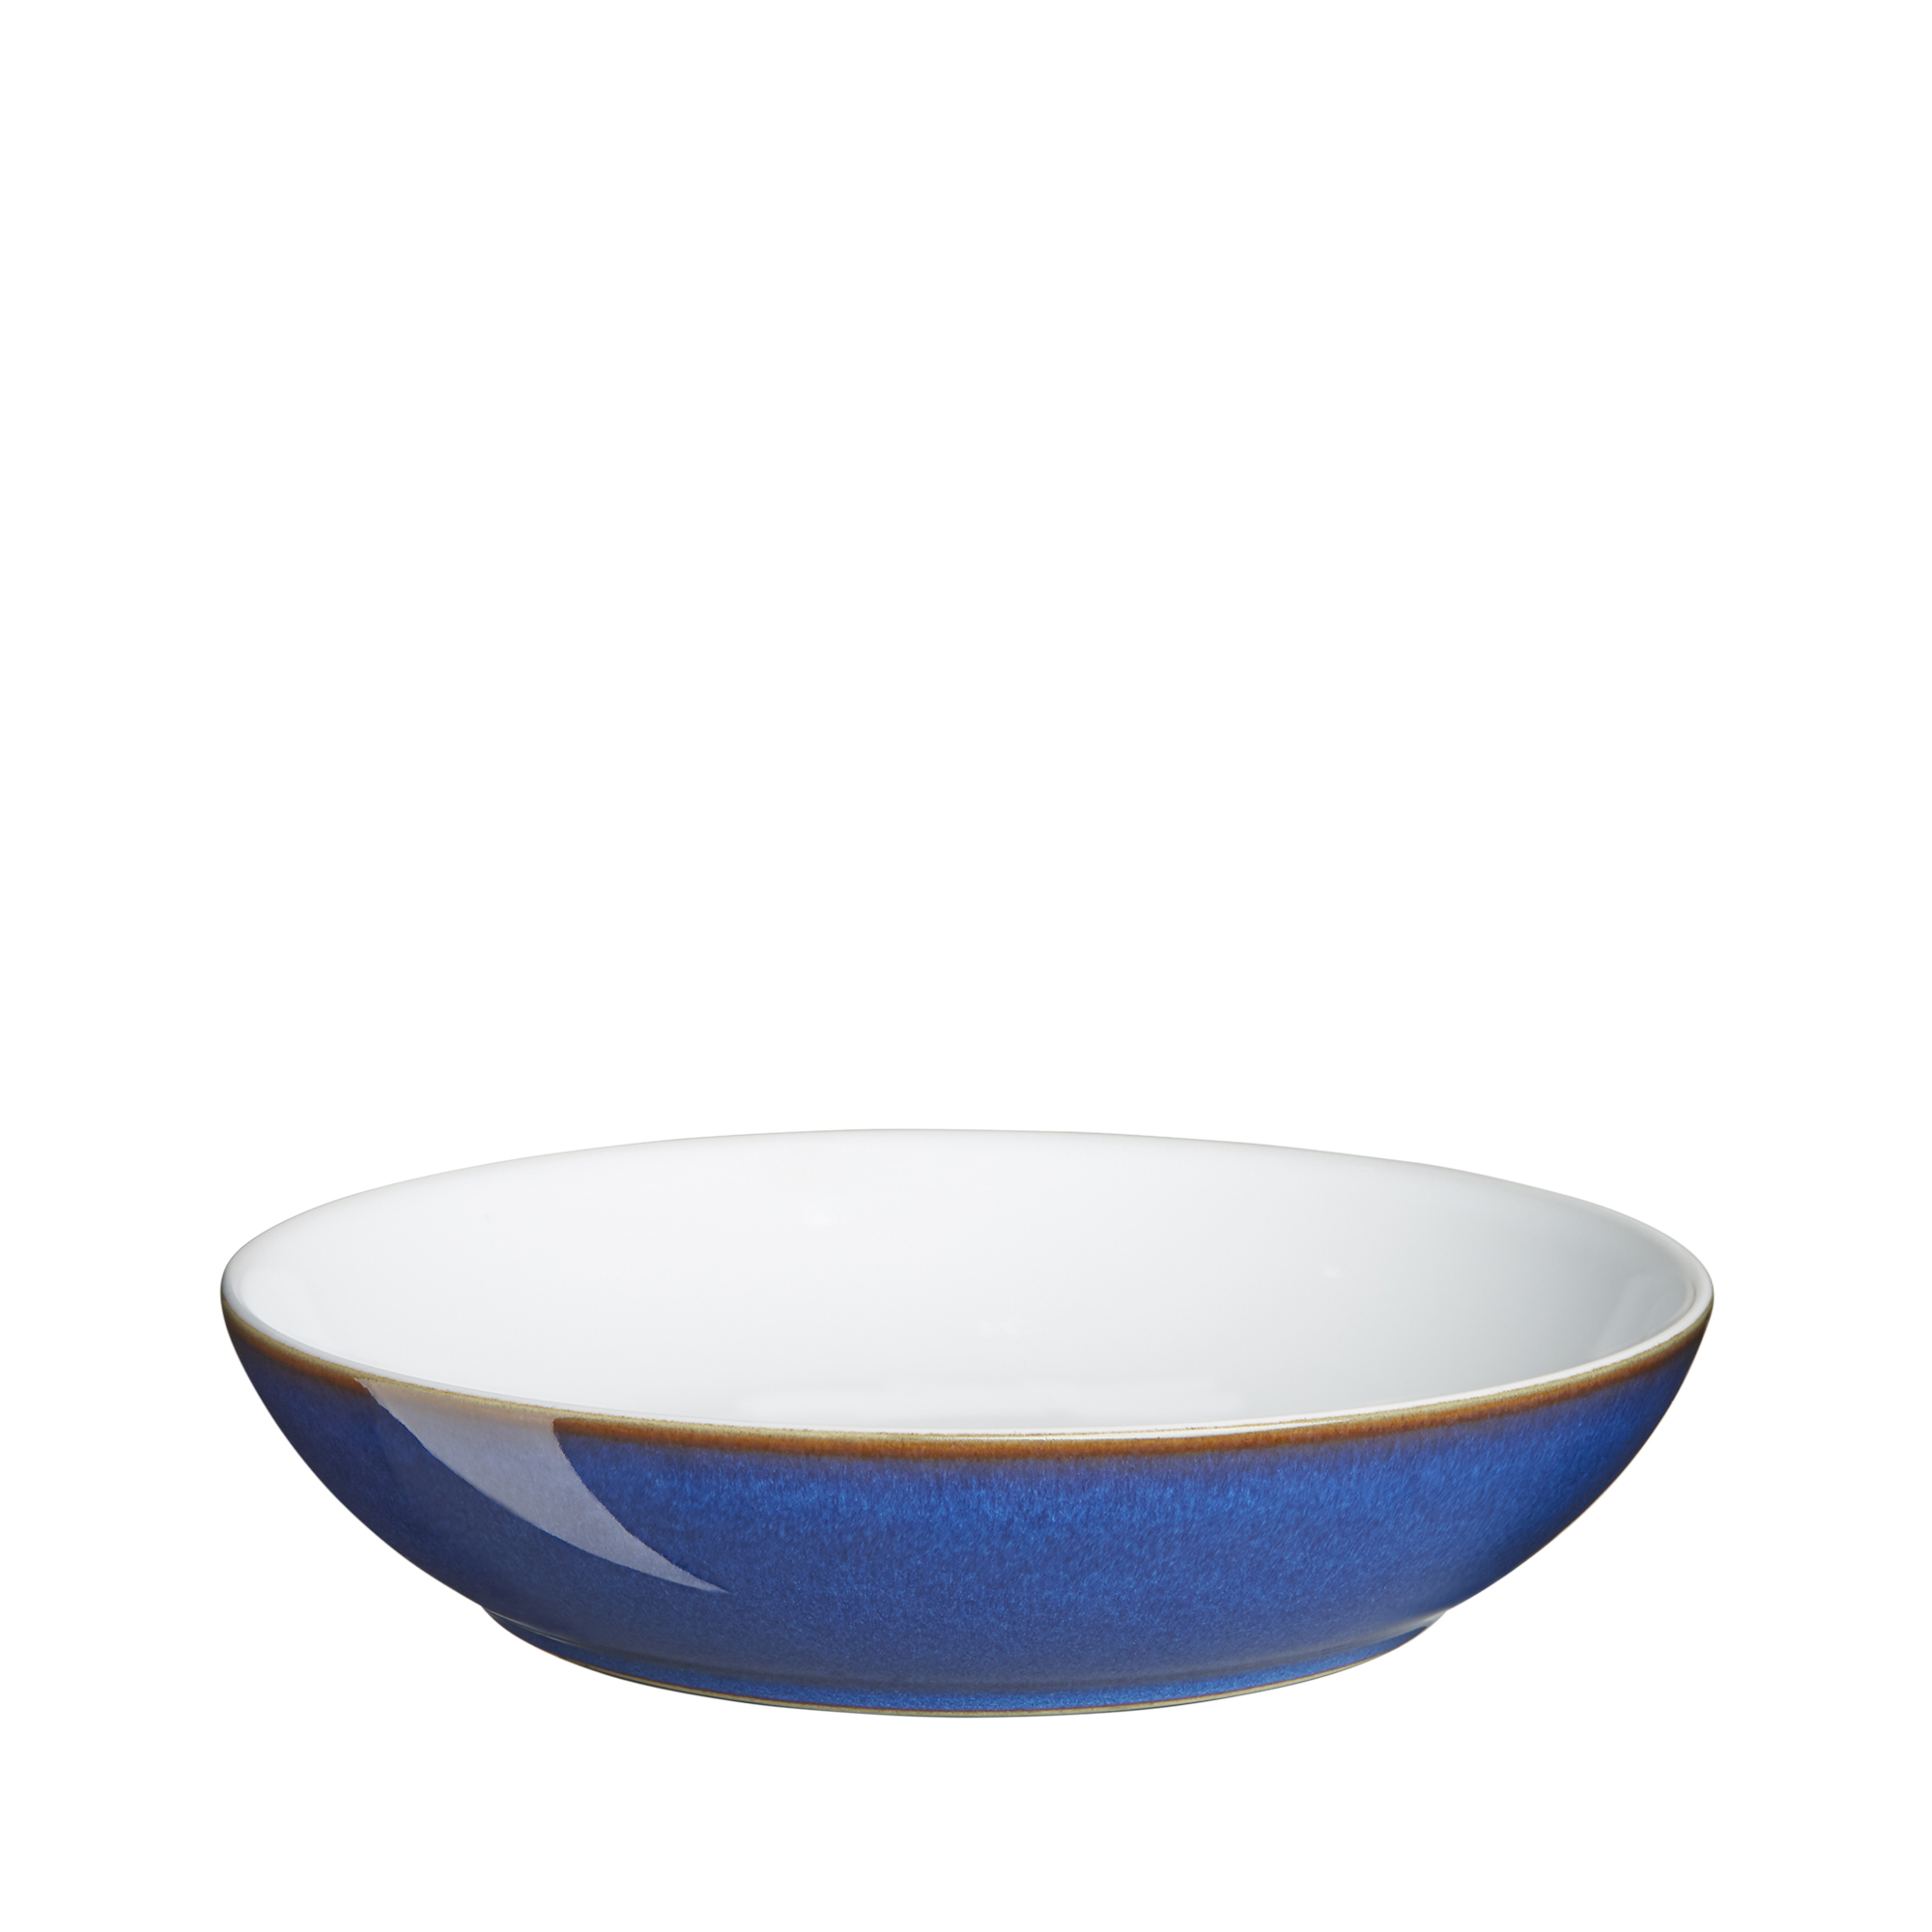 Denby Imperial Blue Pasta Bowl Ebay